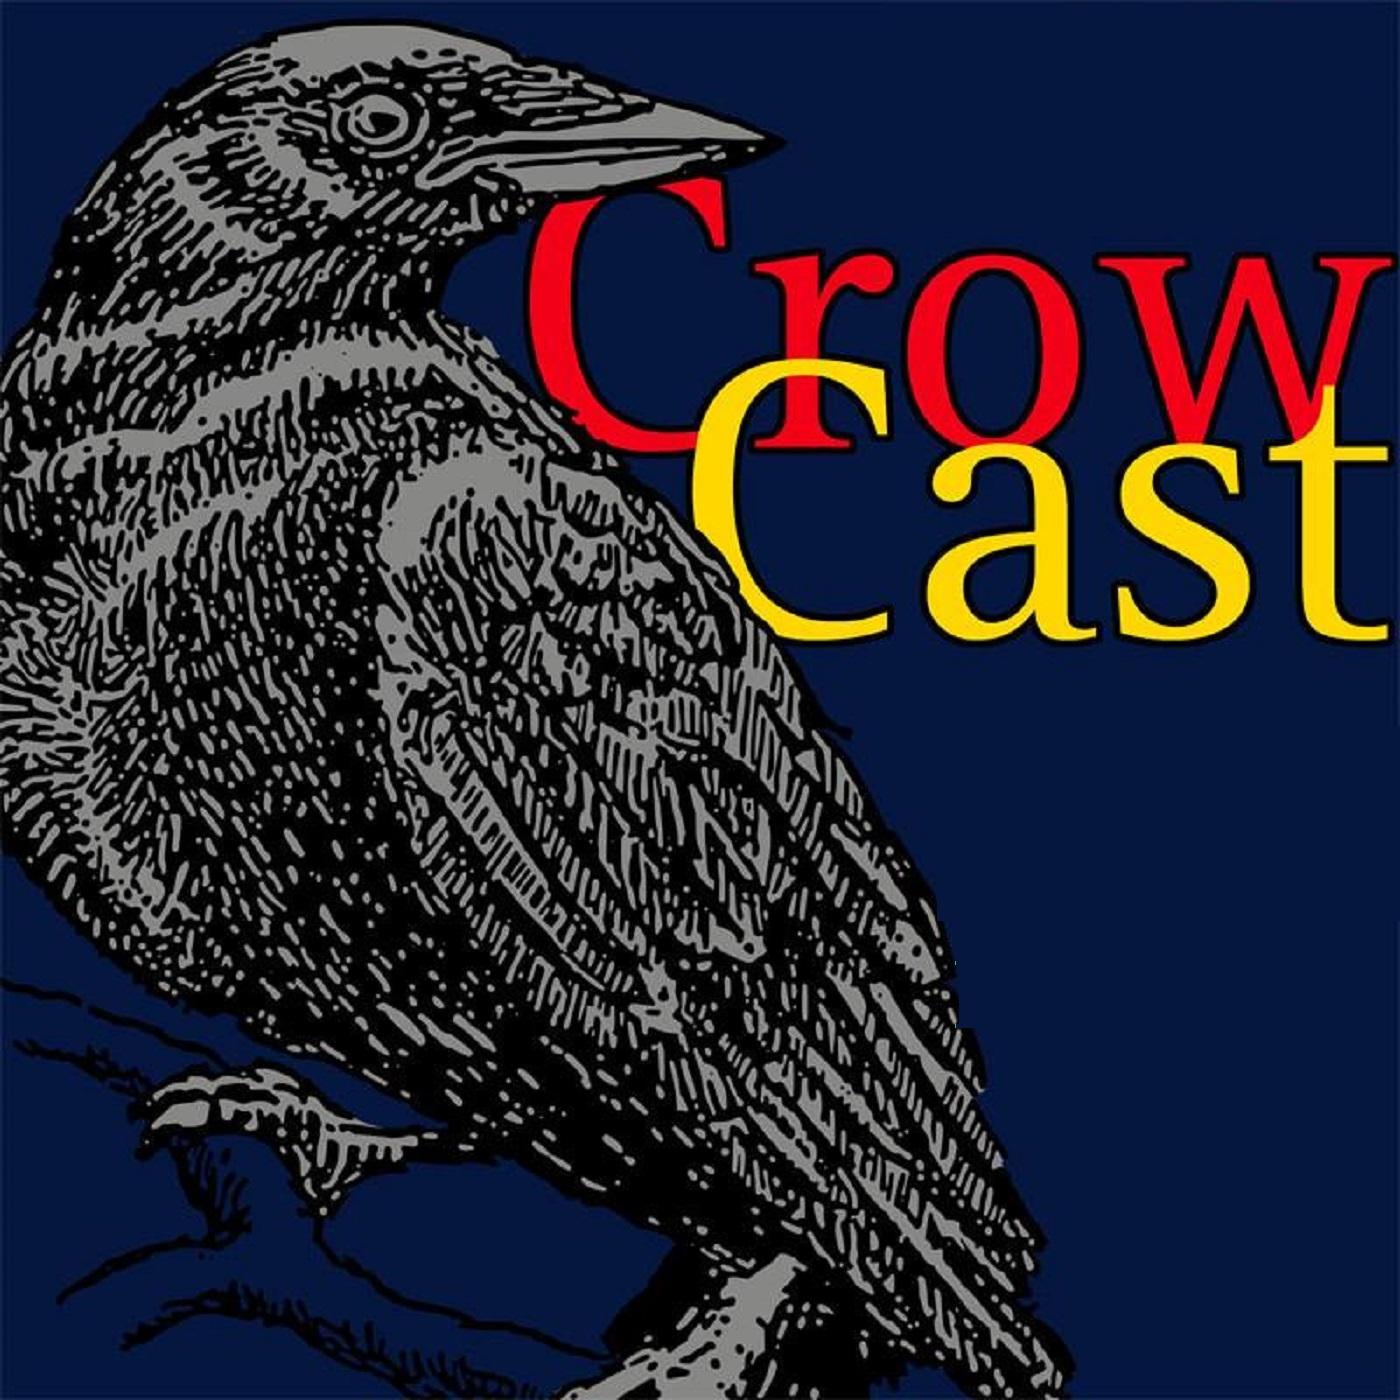 CrowCast - Adelaide Crows Football Club Fan Podcasts